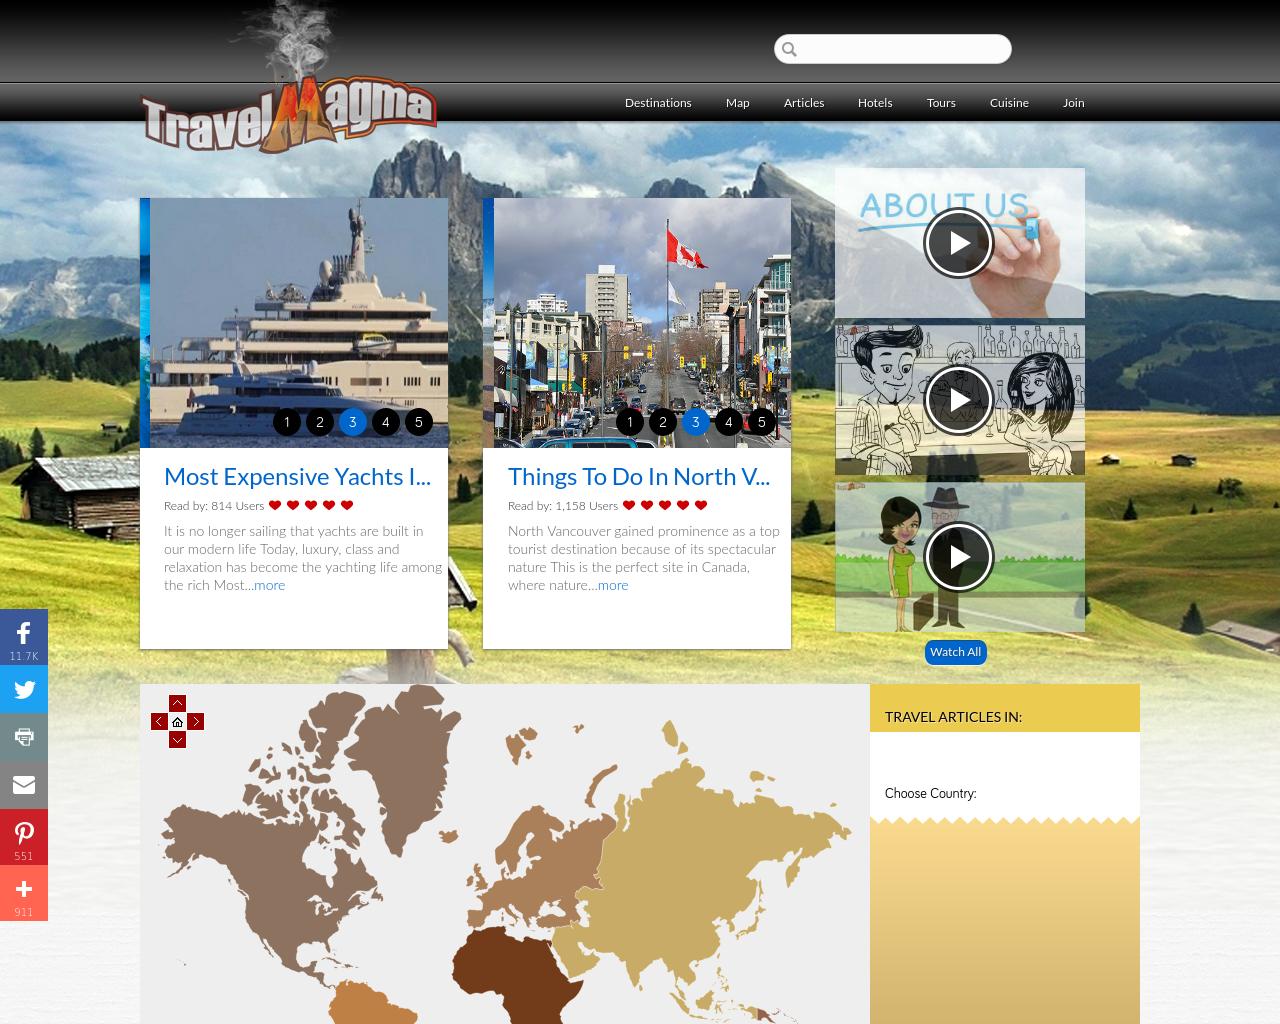 Travel-Magma-Advertising-Reviews-Pricing